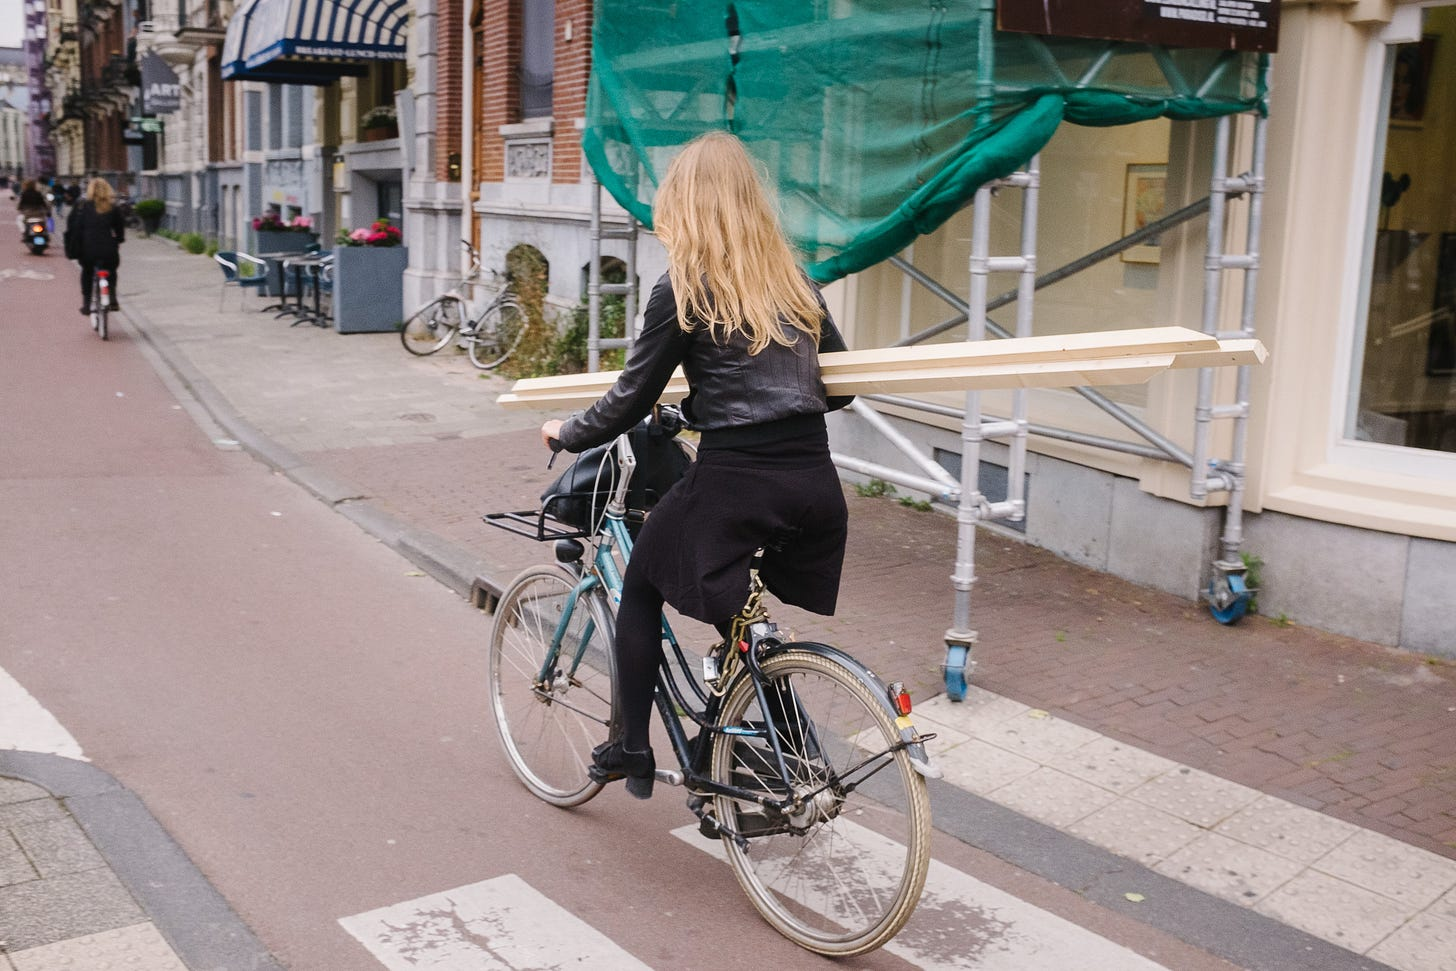 02-amsterdam-2488-pete-carr.jpg